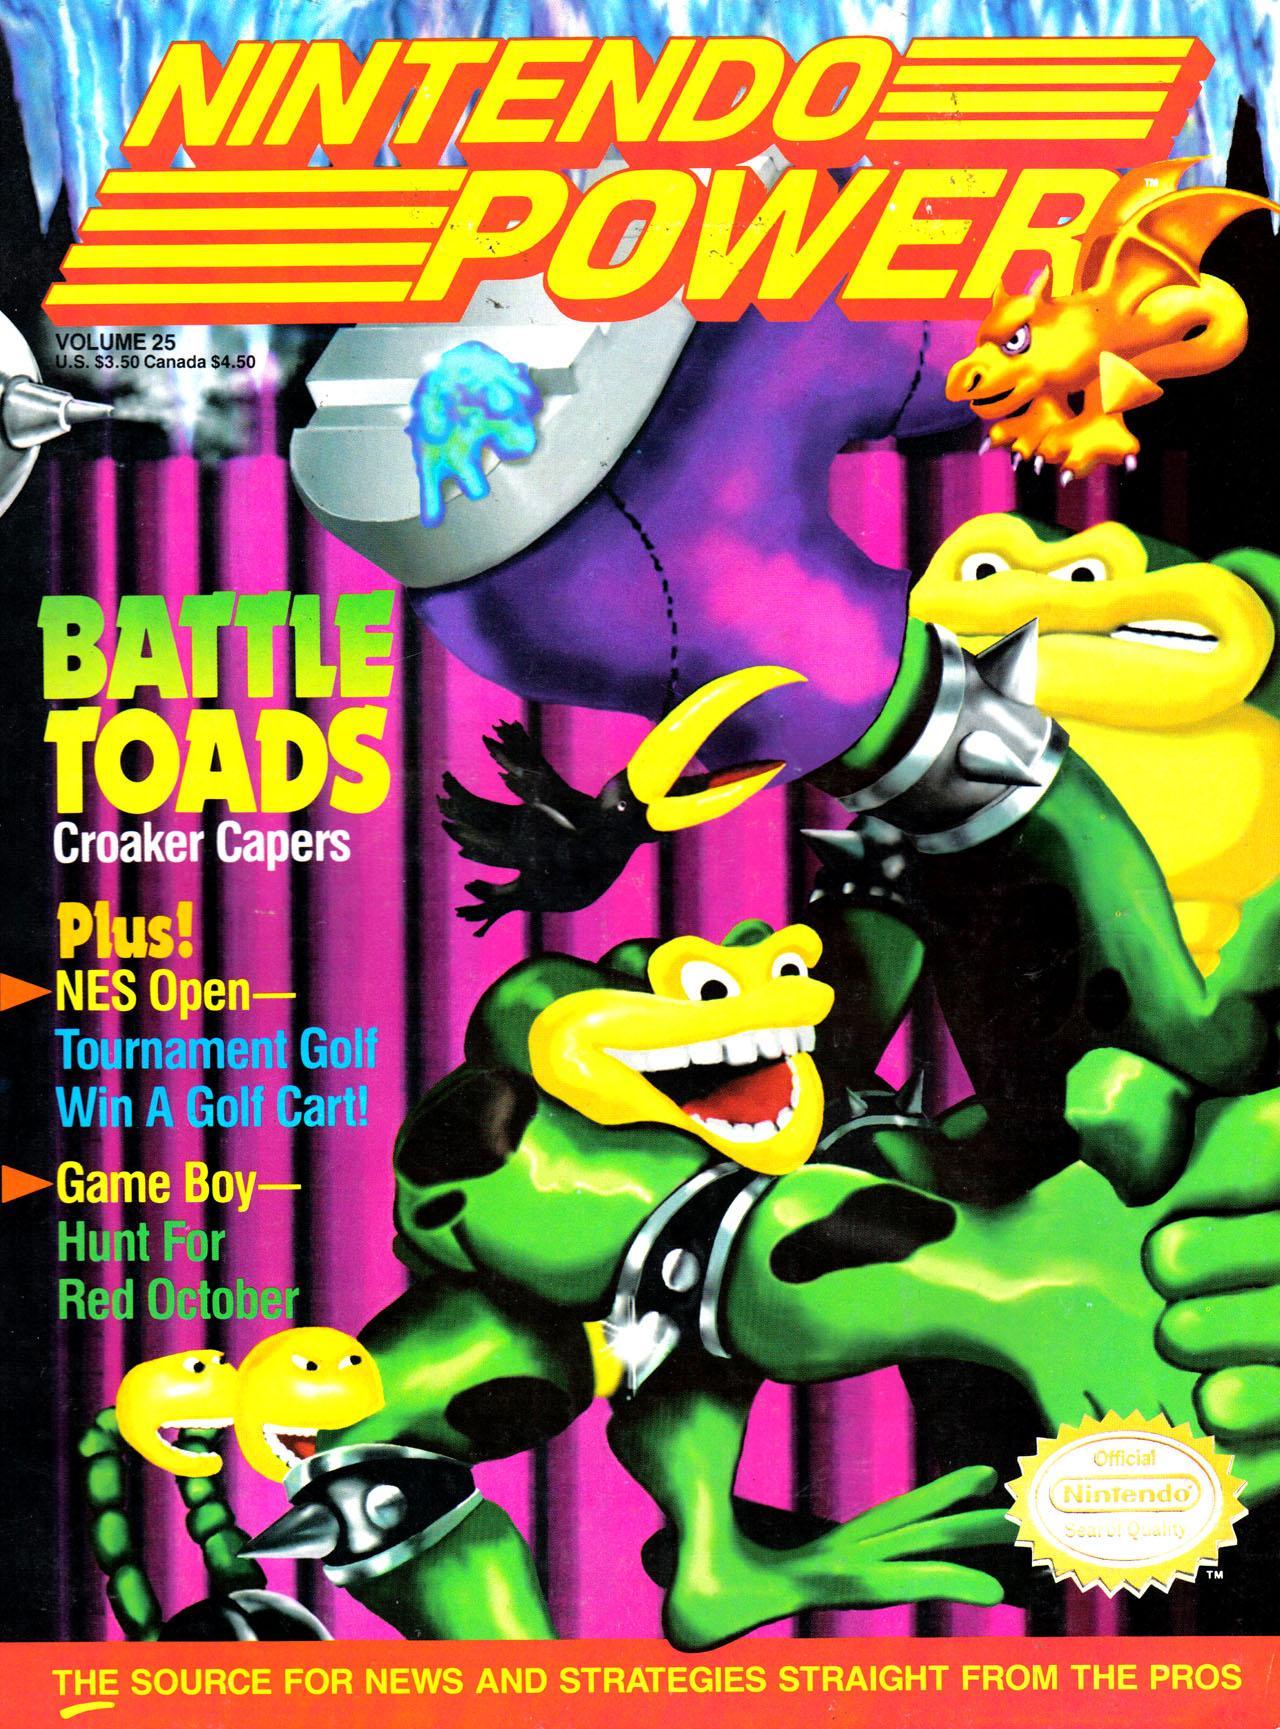 Nintendo Power Magazine - Lot of 9 - 2003 and 2004